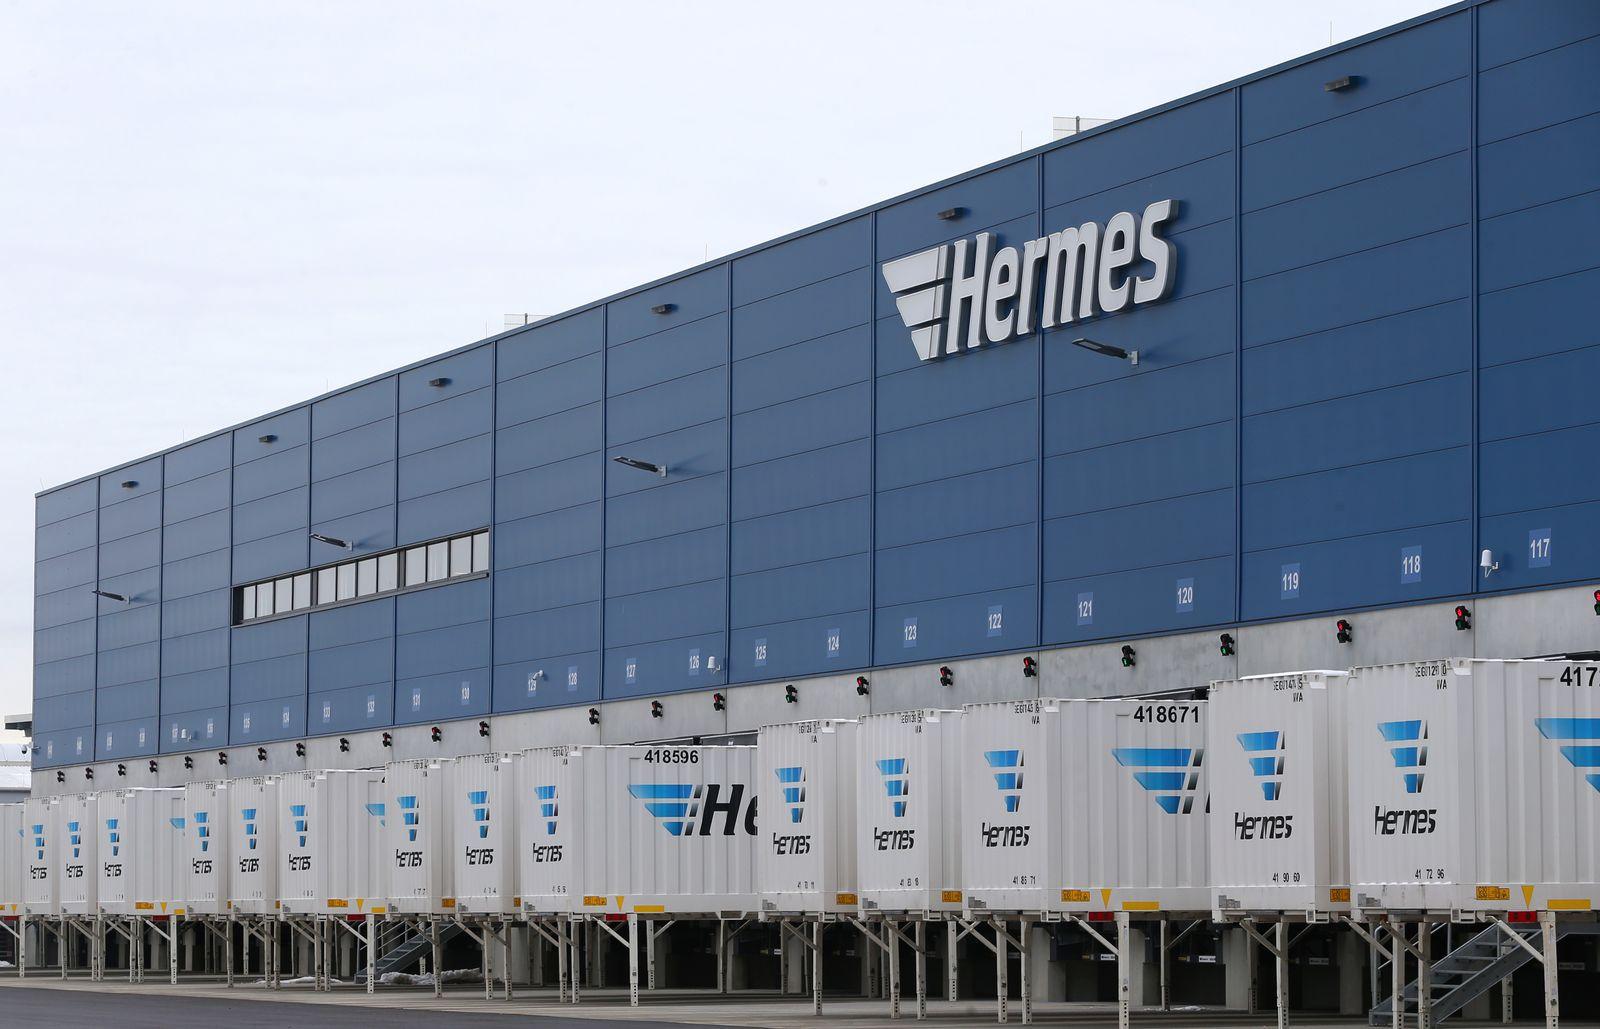 Hemes Logistikzentrum